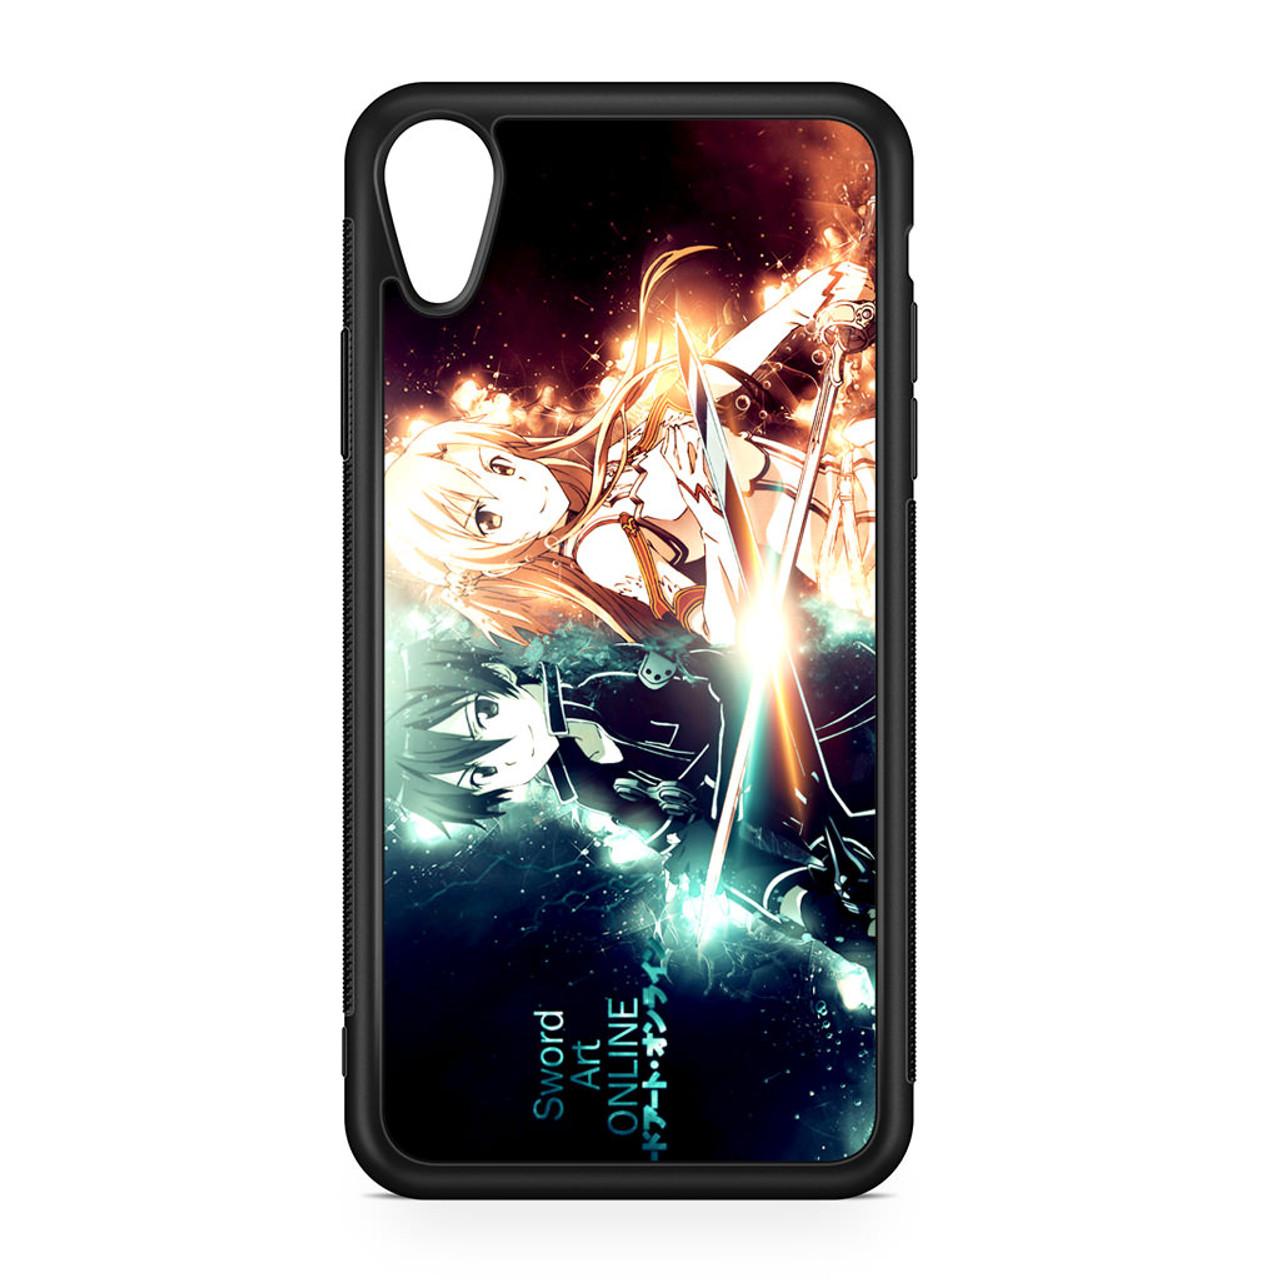 half off 8b8c7 c828c Sword Art Online Kirito and Asuna iPhone XR Case